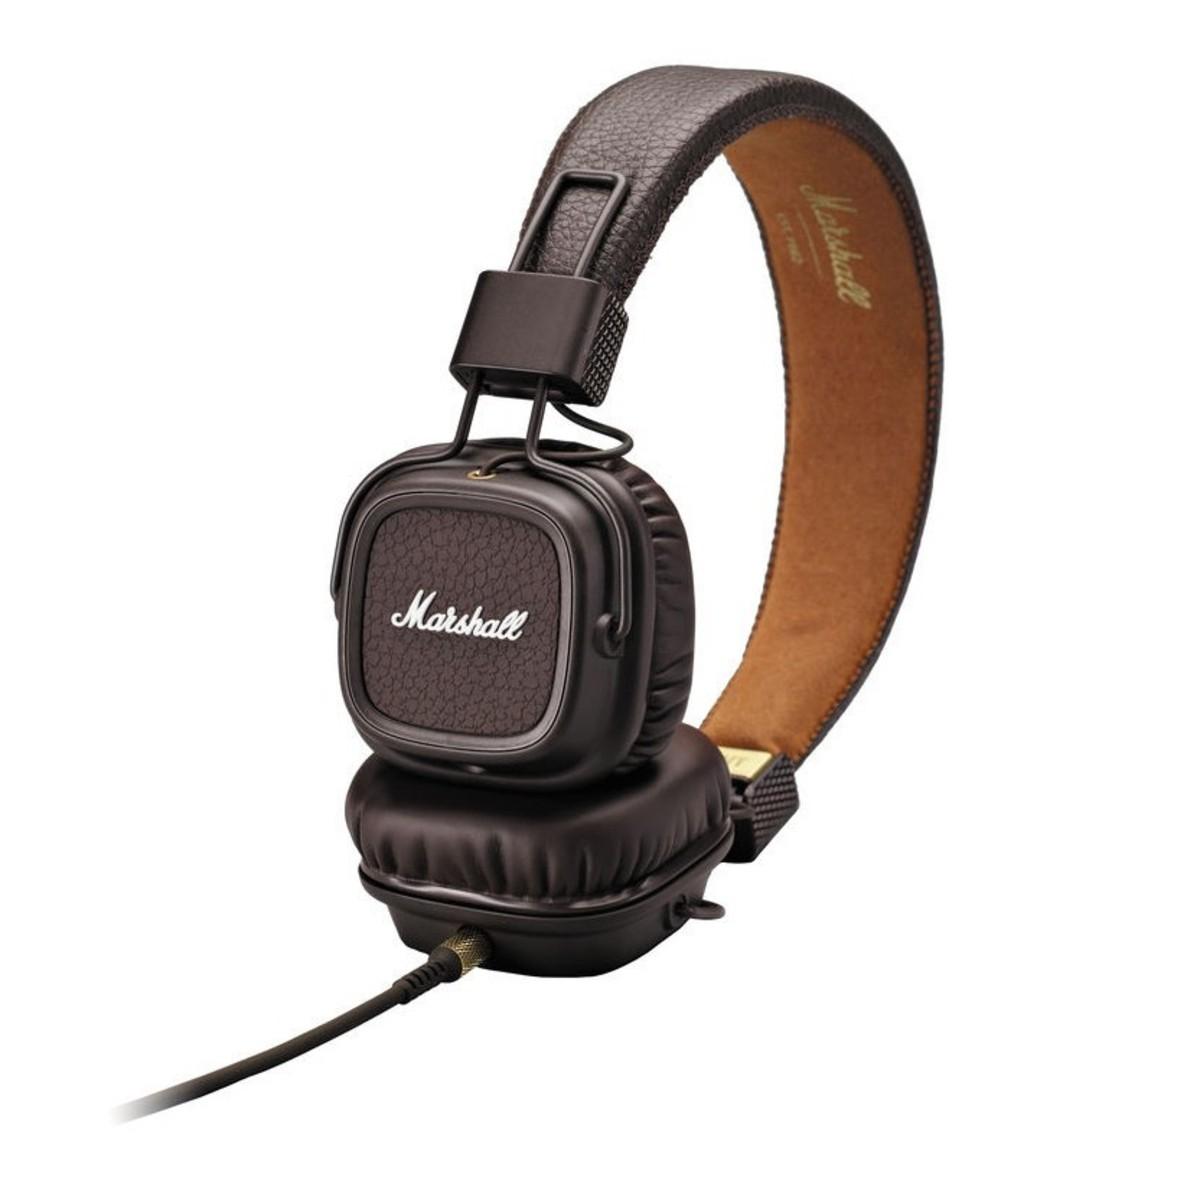 marshall major ii headphones brown at gear4music. Black Bedroom Furniture Sets. Home Design Ideas